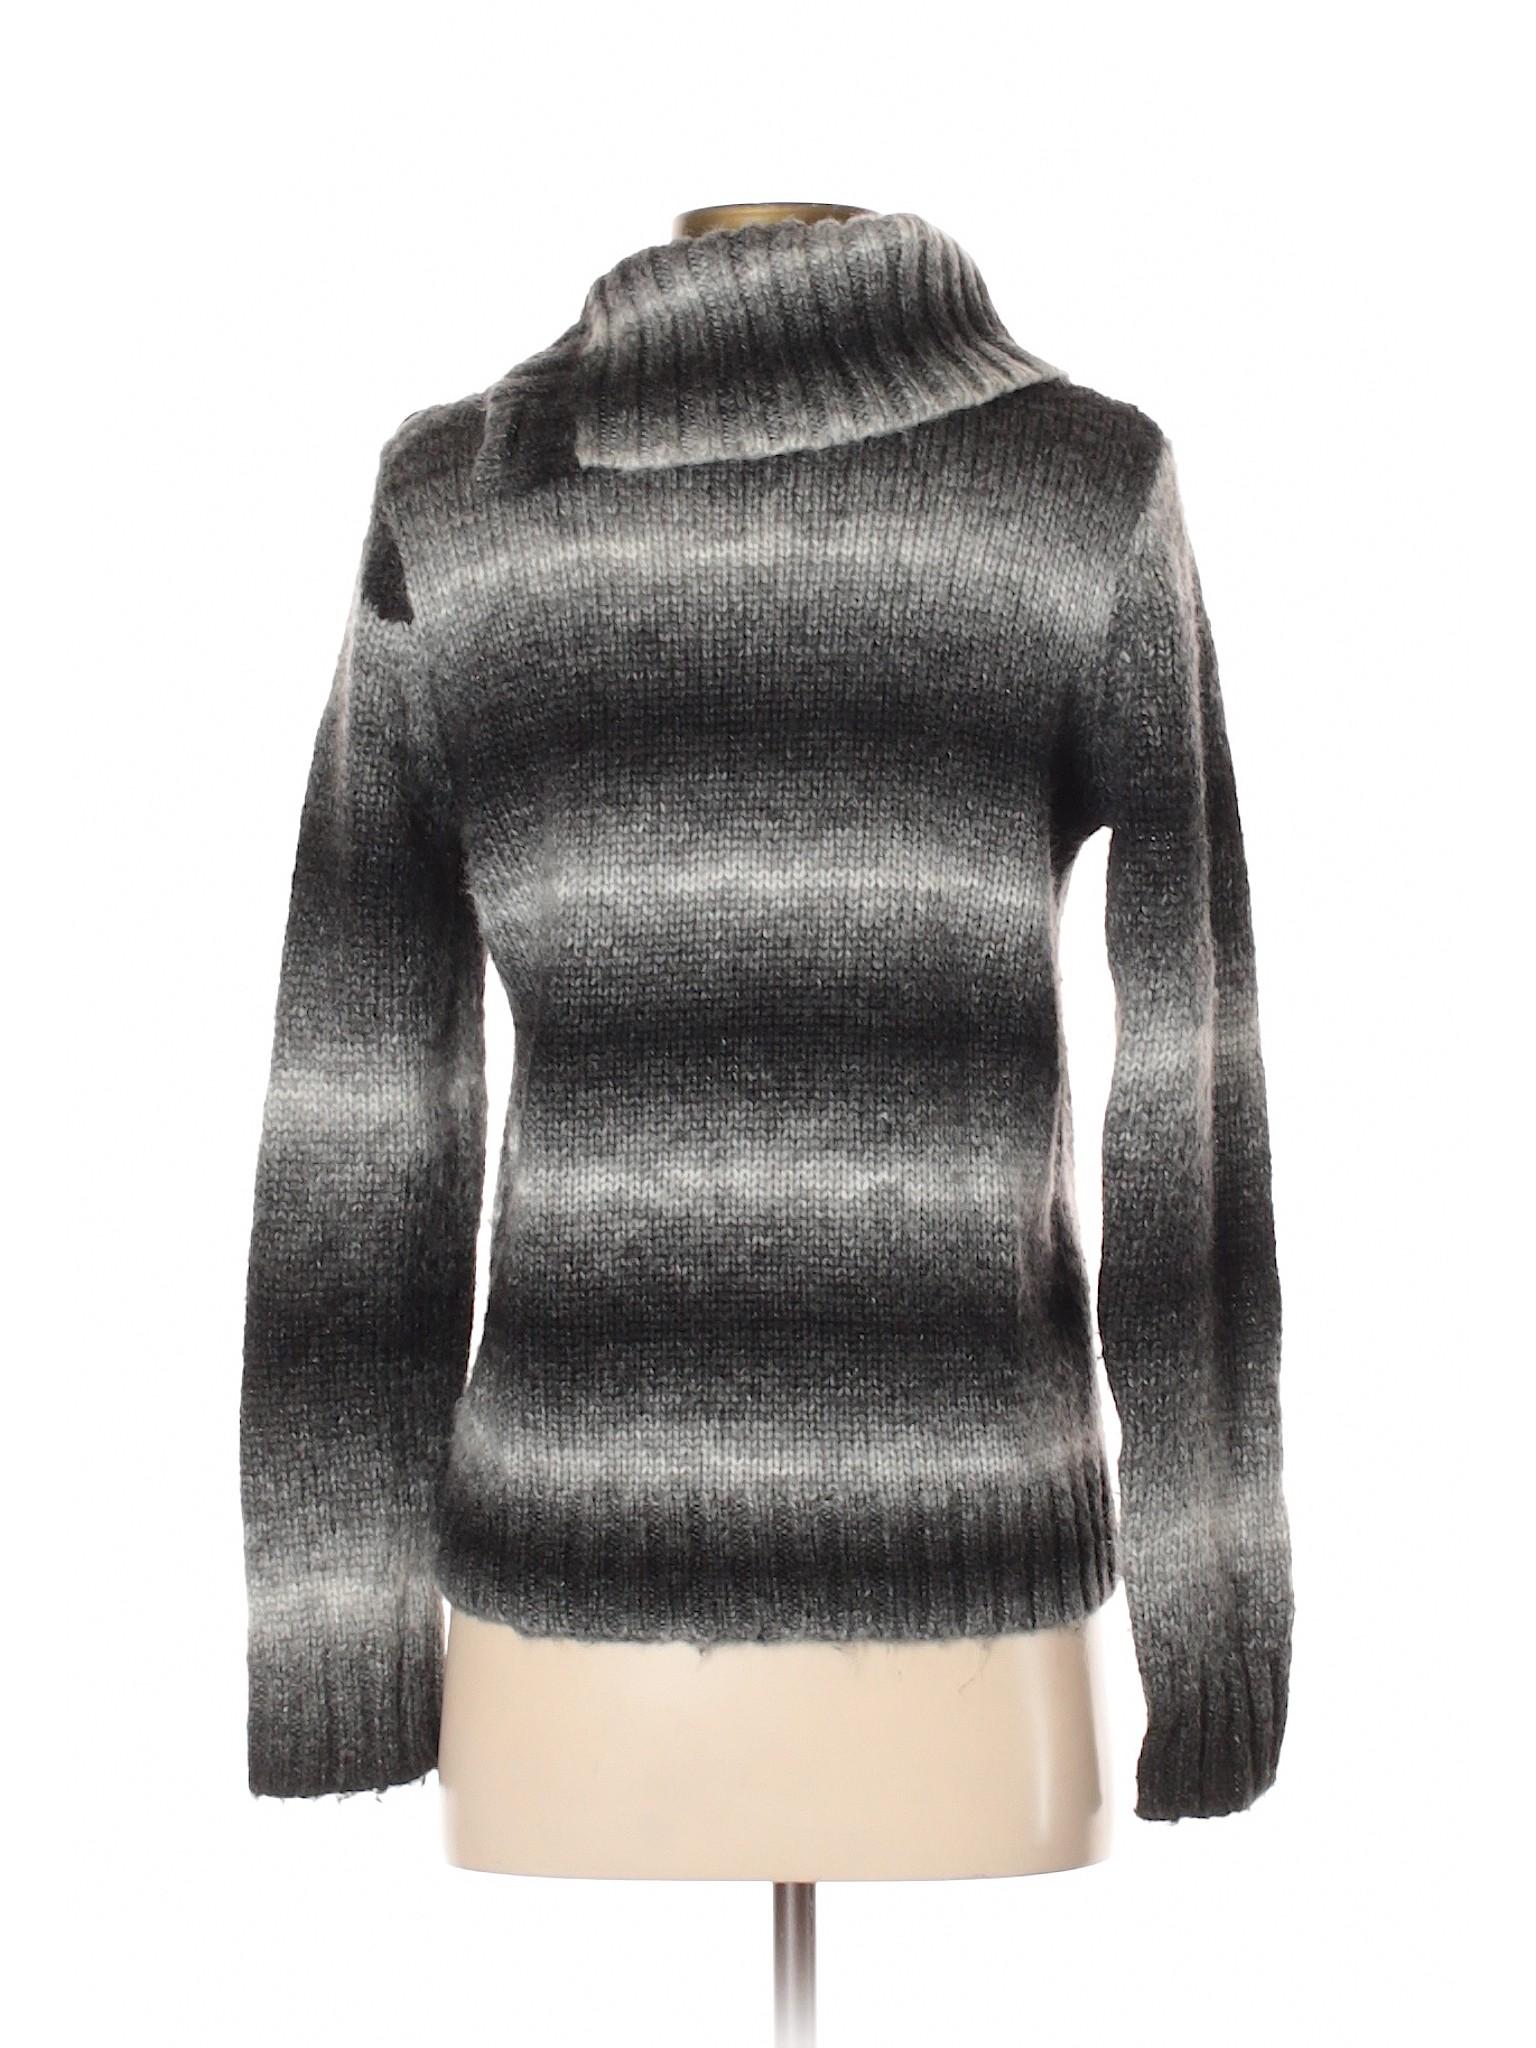 York Sweater Sport New Pullover winter Jones Boutique qYOfwx80tx